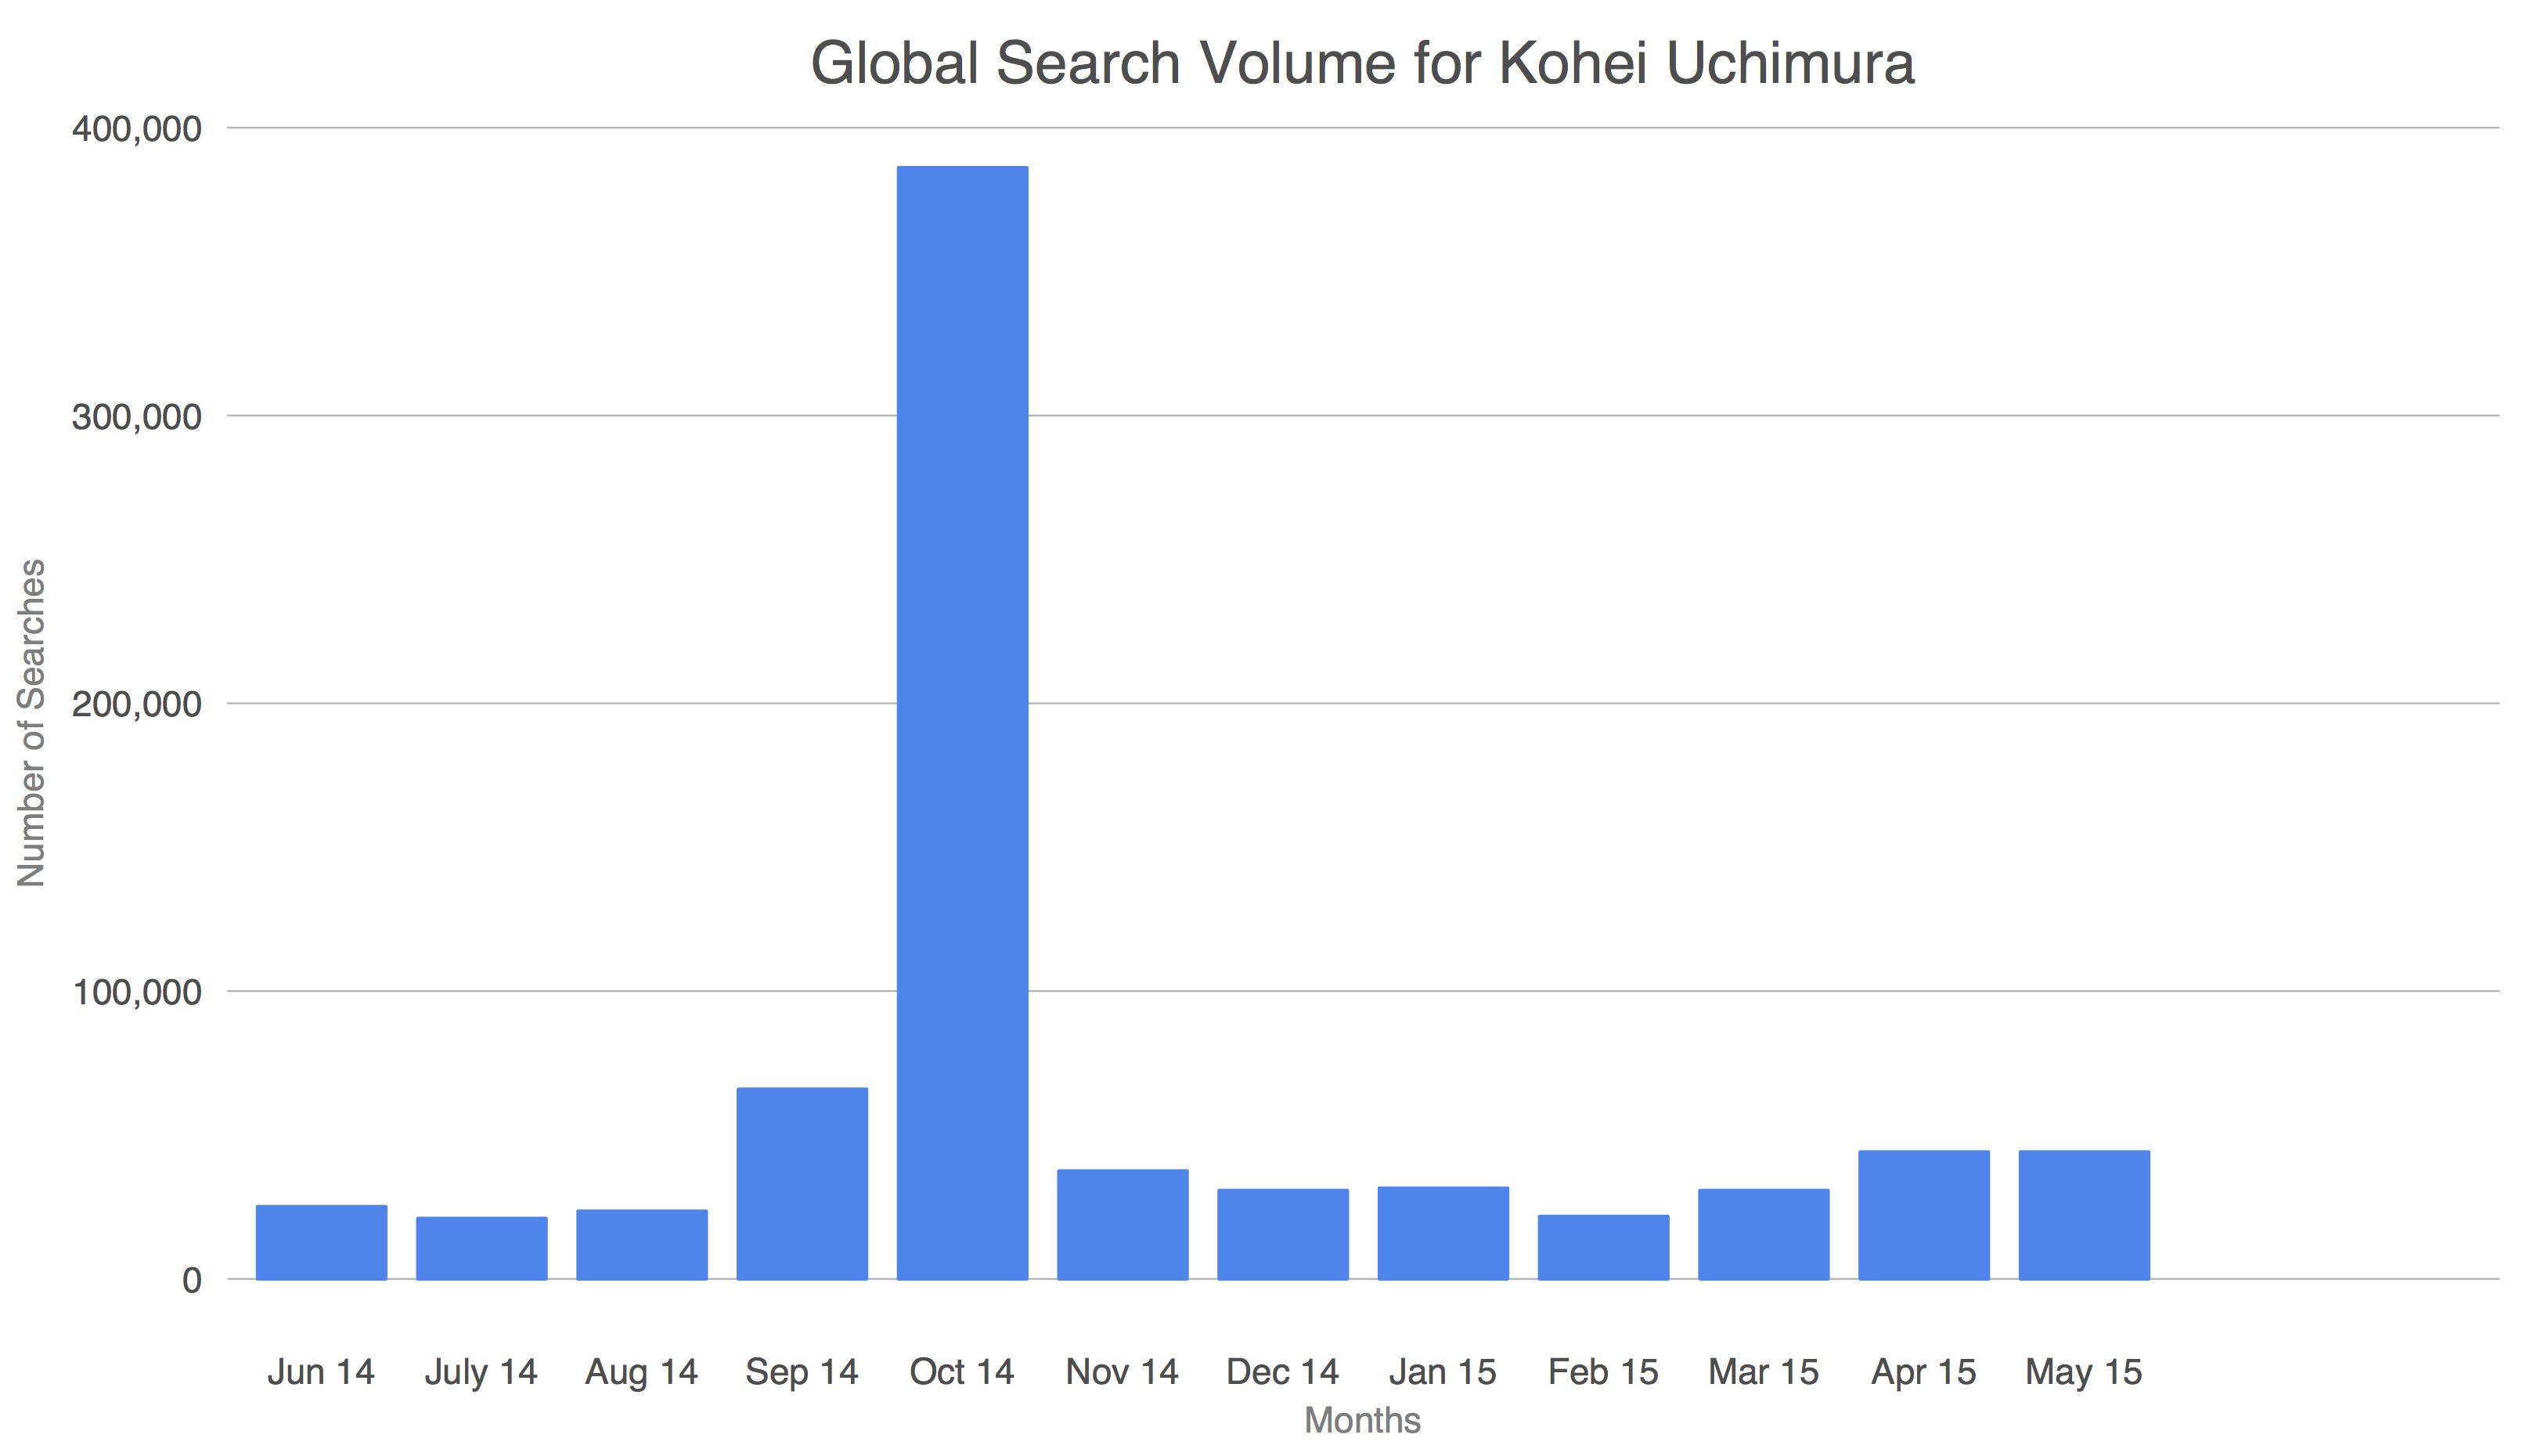 Global Search Volume - Kohei Uchimura